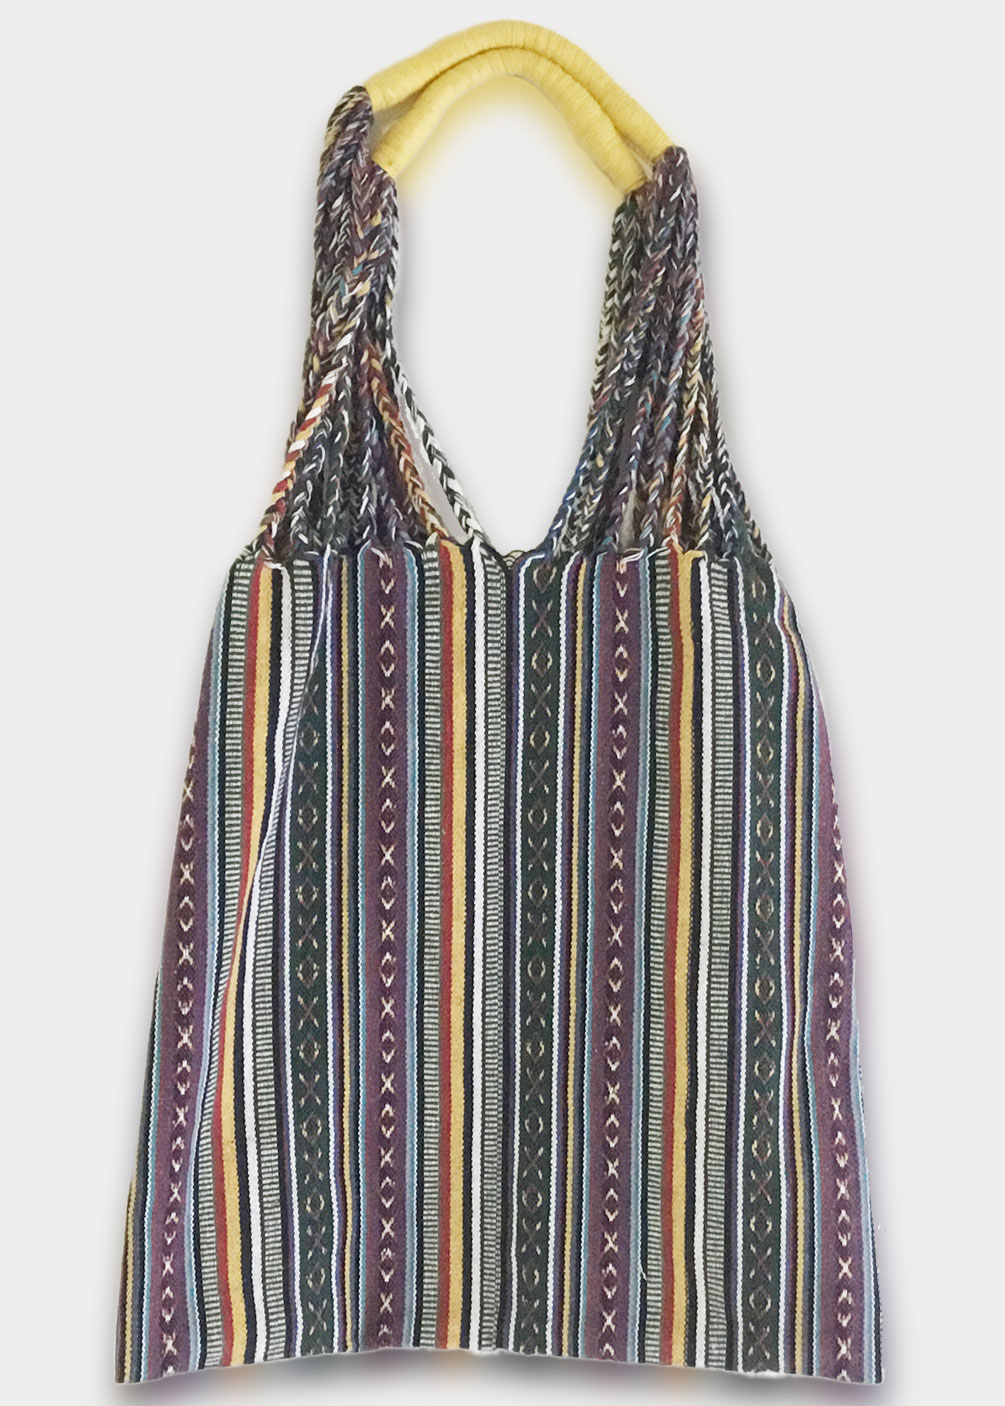 bolso hippie chic tejido saco tallas grandes curvy